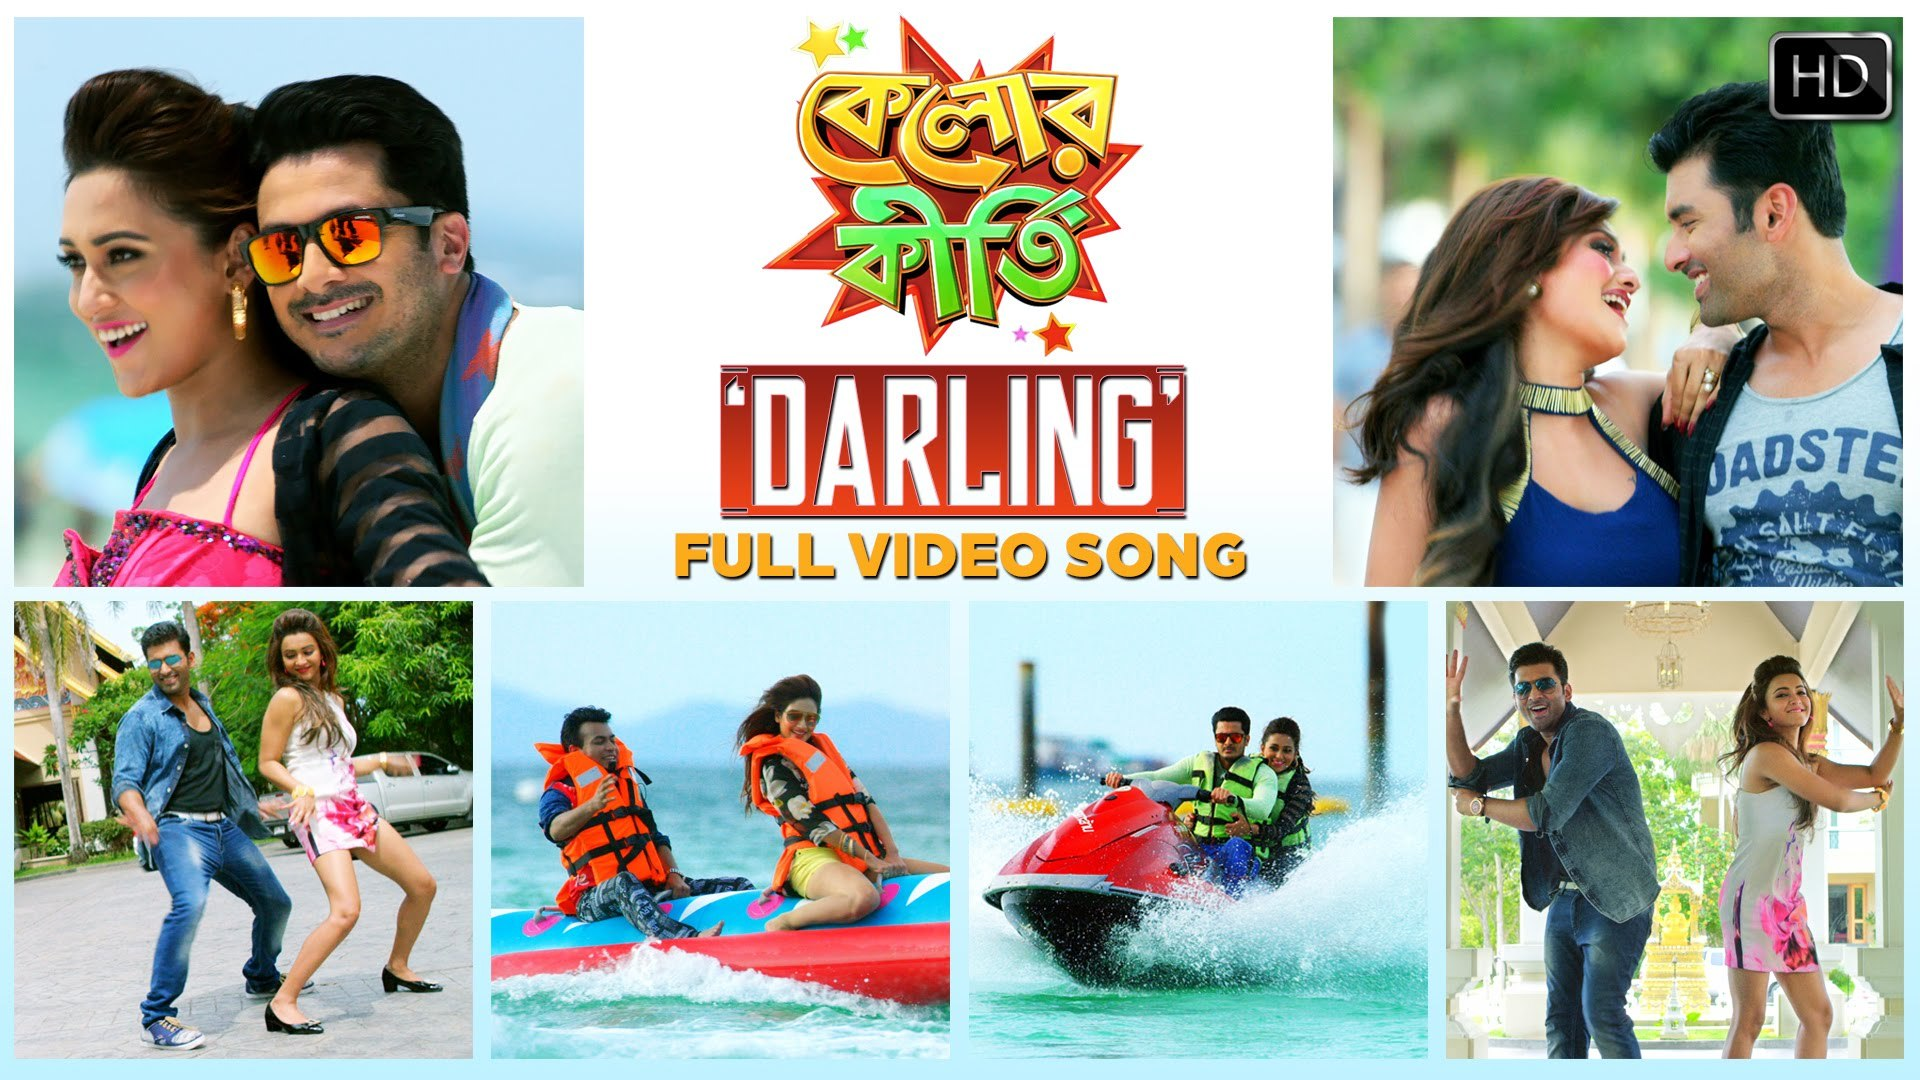 Darling Film Kelor Kirti Dev Jishu Sengupta Ankush Mimi Nusrat Koushani ᴴᴰ